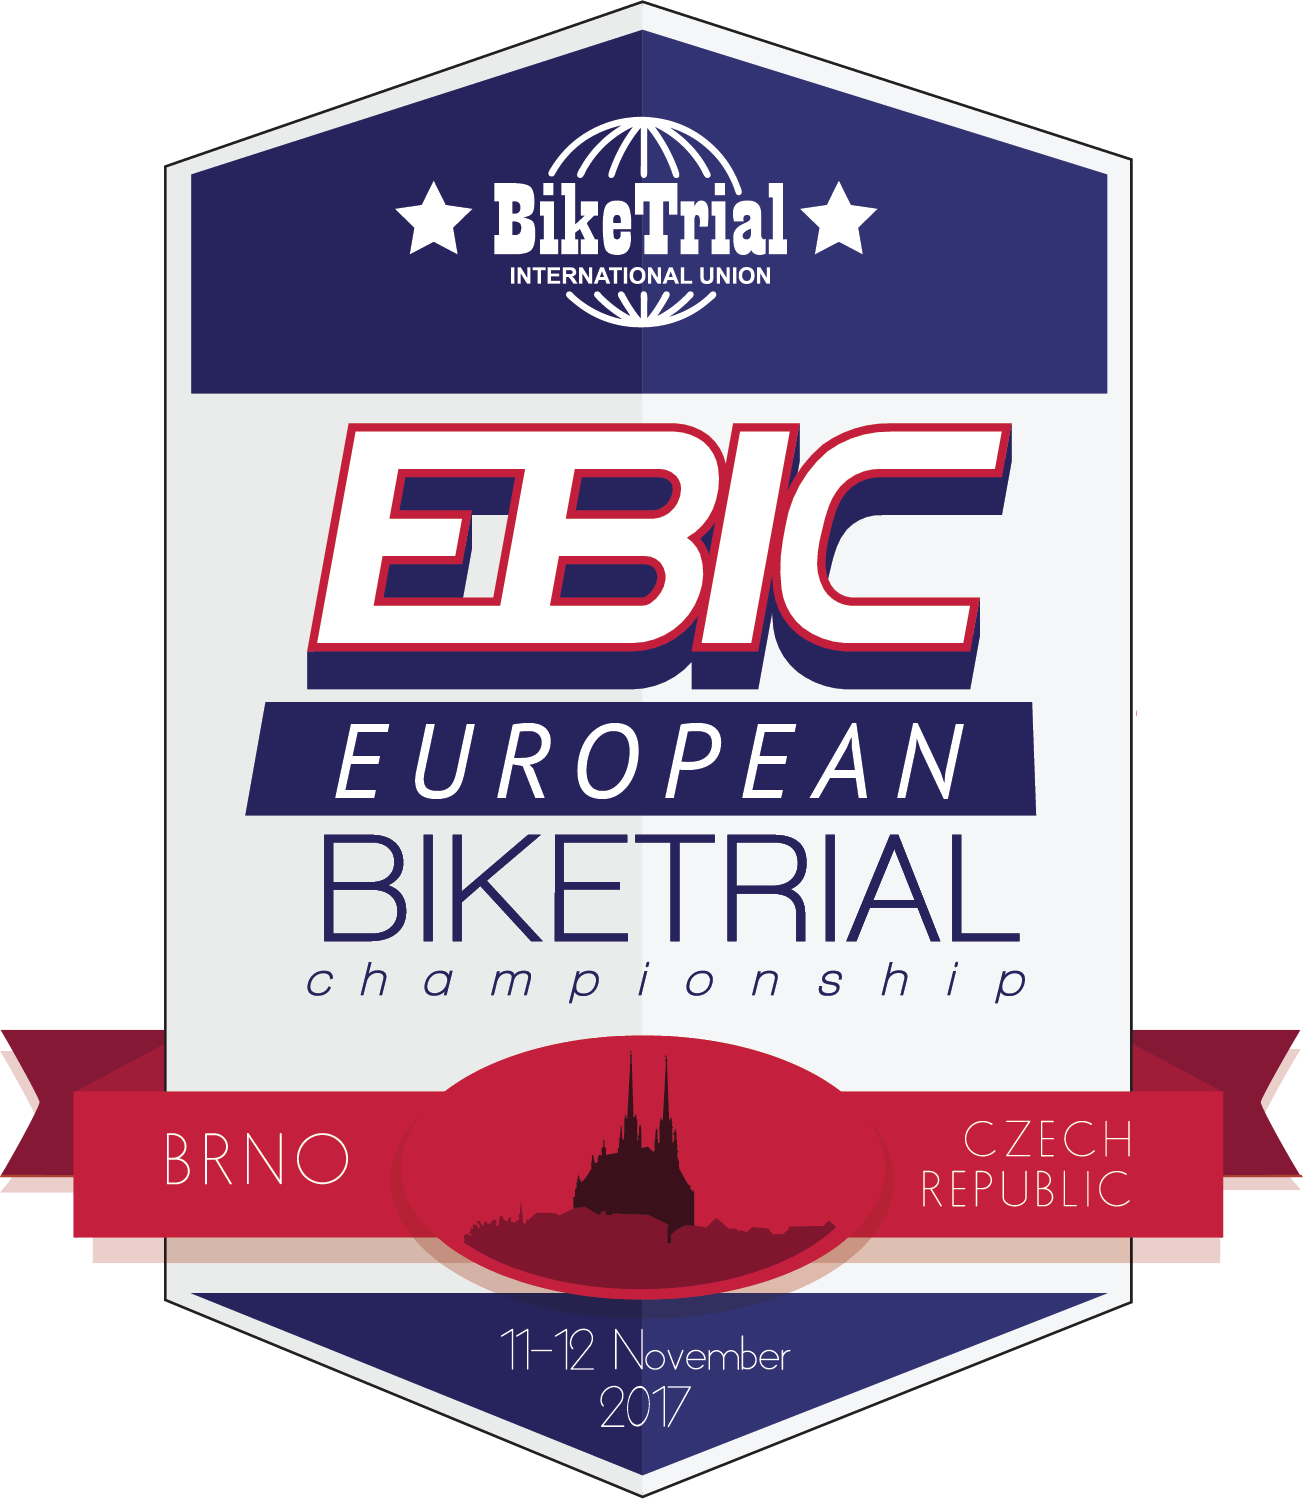 EBIC_2017_R1